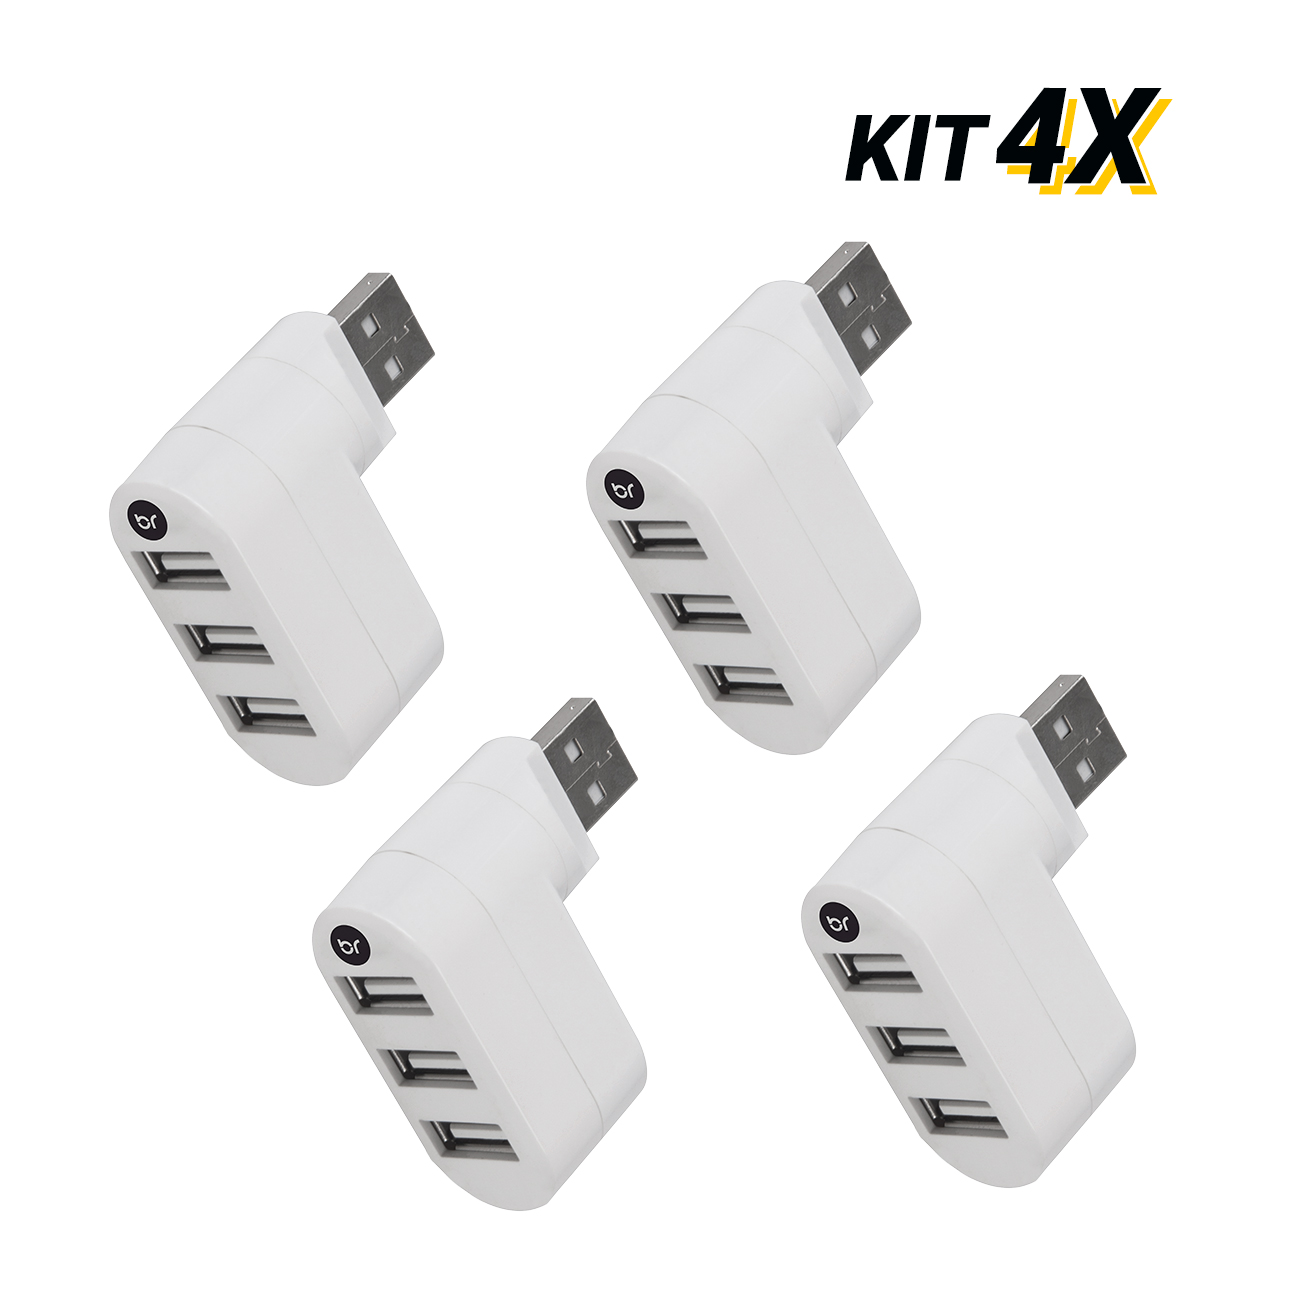 Kit 4 Mini Hub Usb Conector Giratório Com 3 Portas 2.0 Fast  - BRIGHT